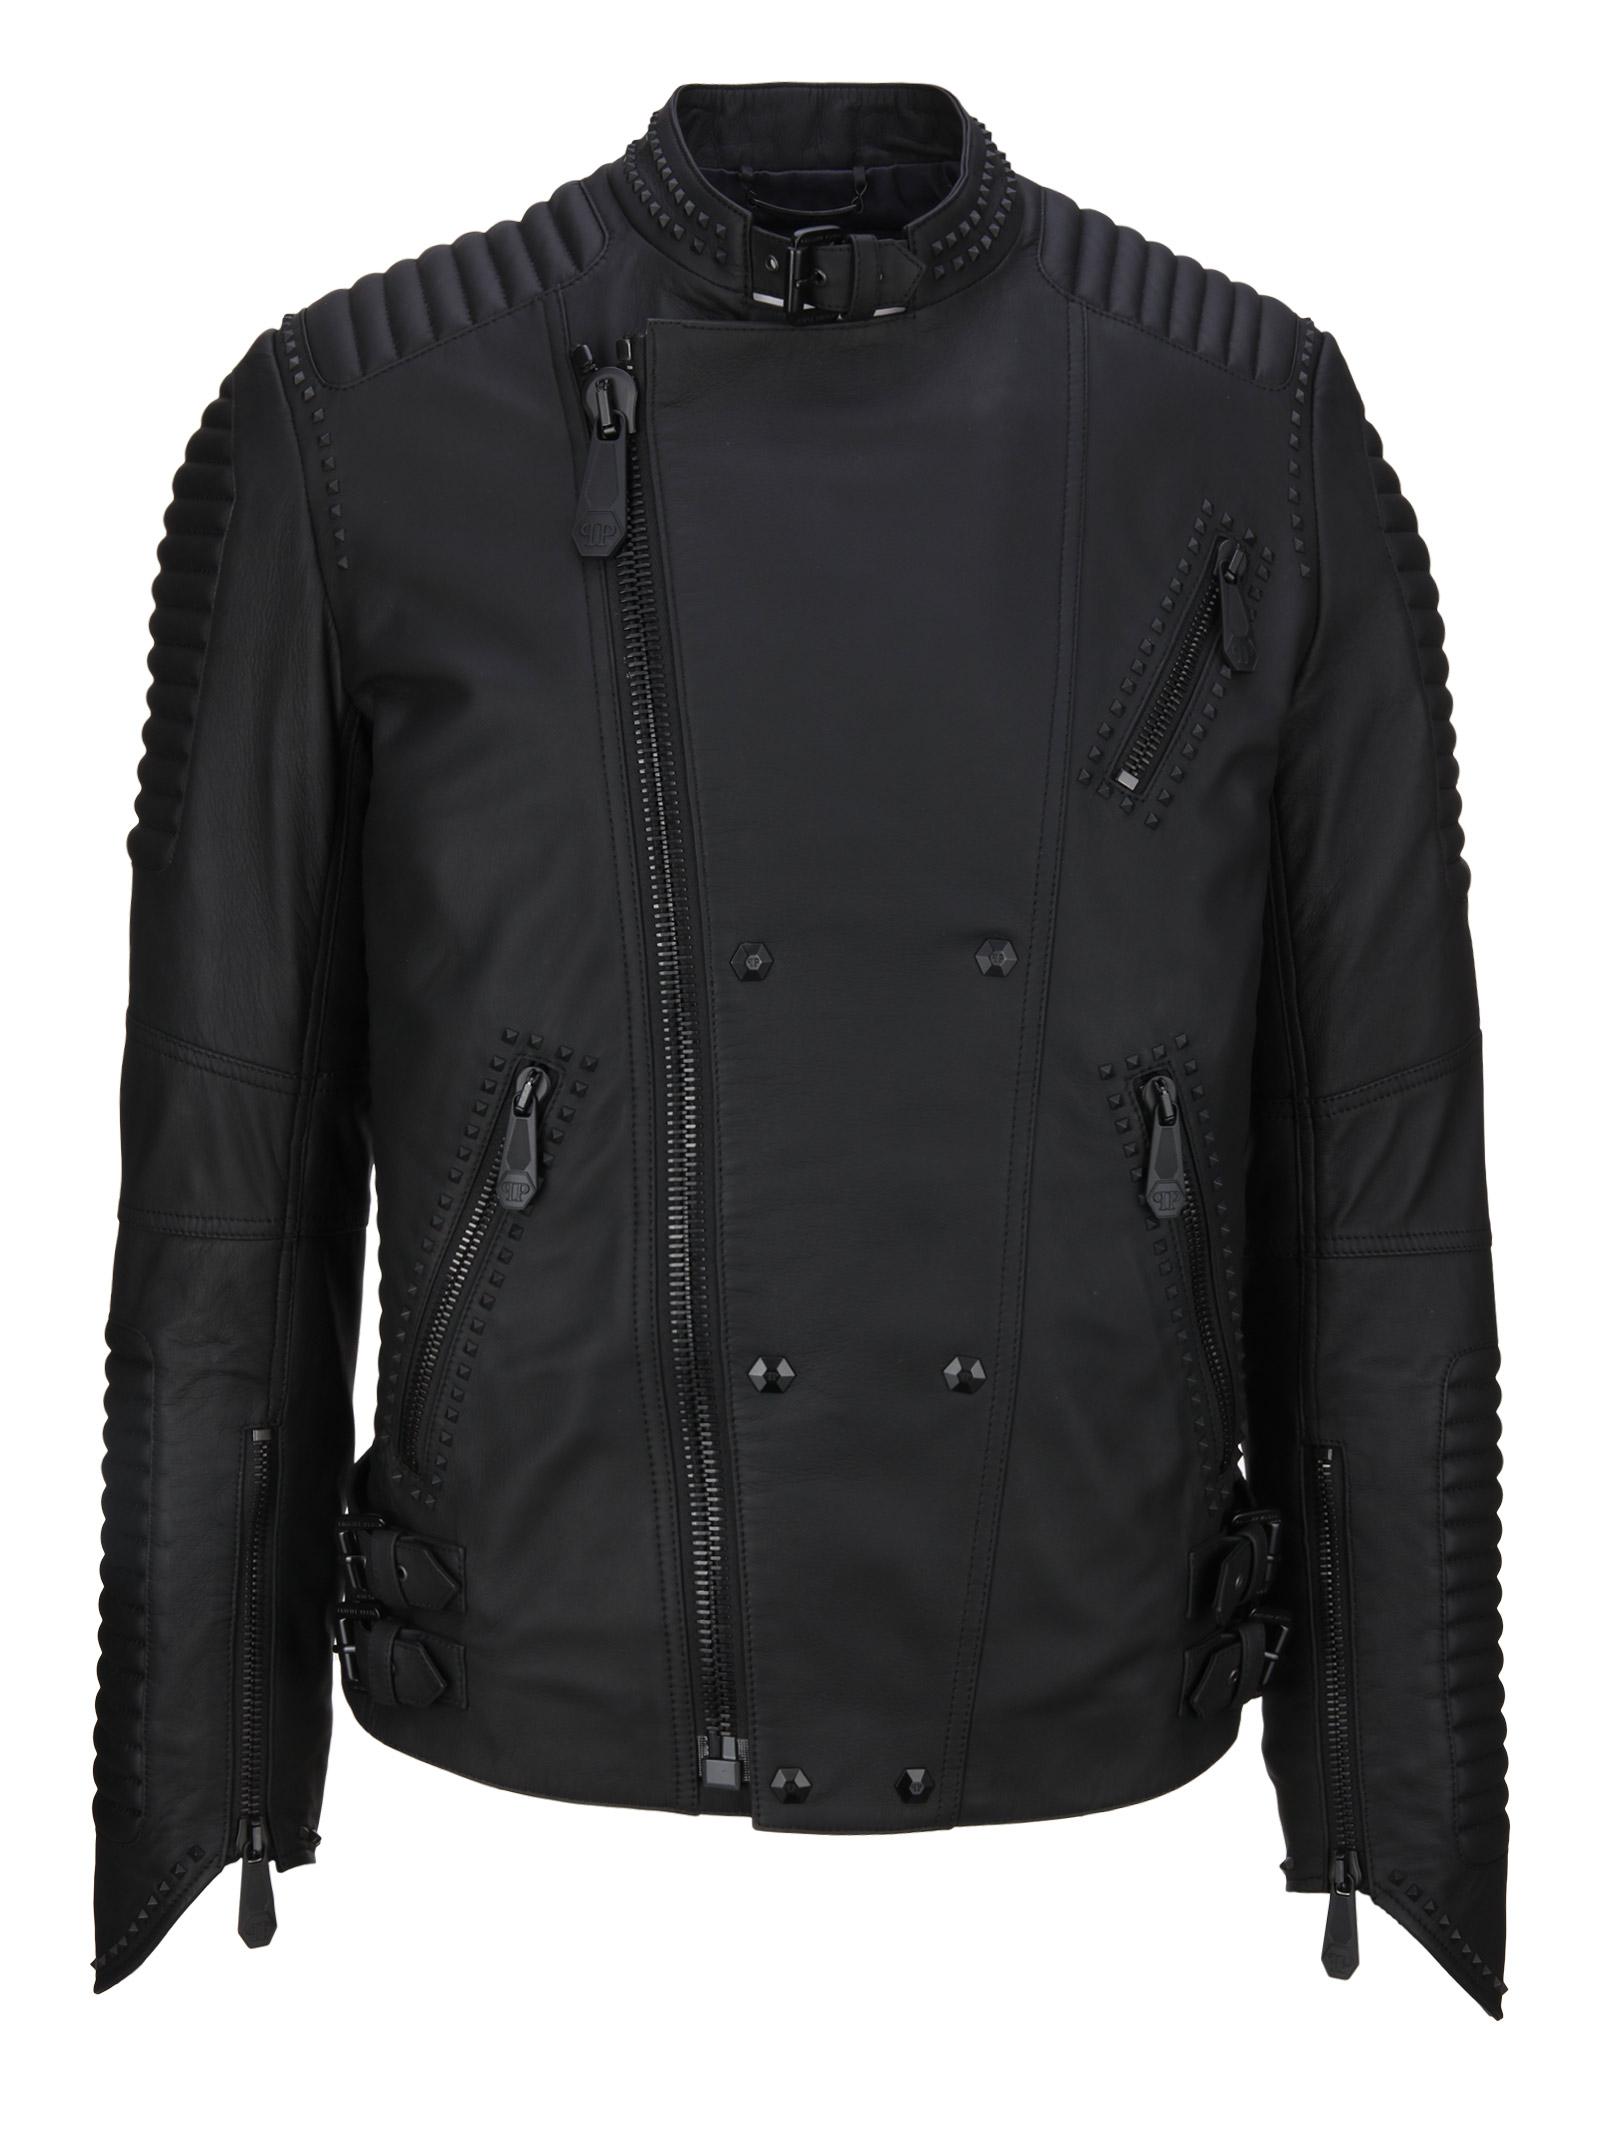 0fc9dab12a05c PHILIPP PLEIN Jacket - PHILIPP PLEIN - Michele Franzese Moda